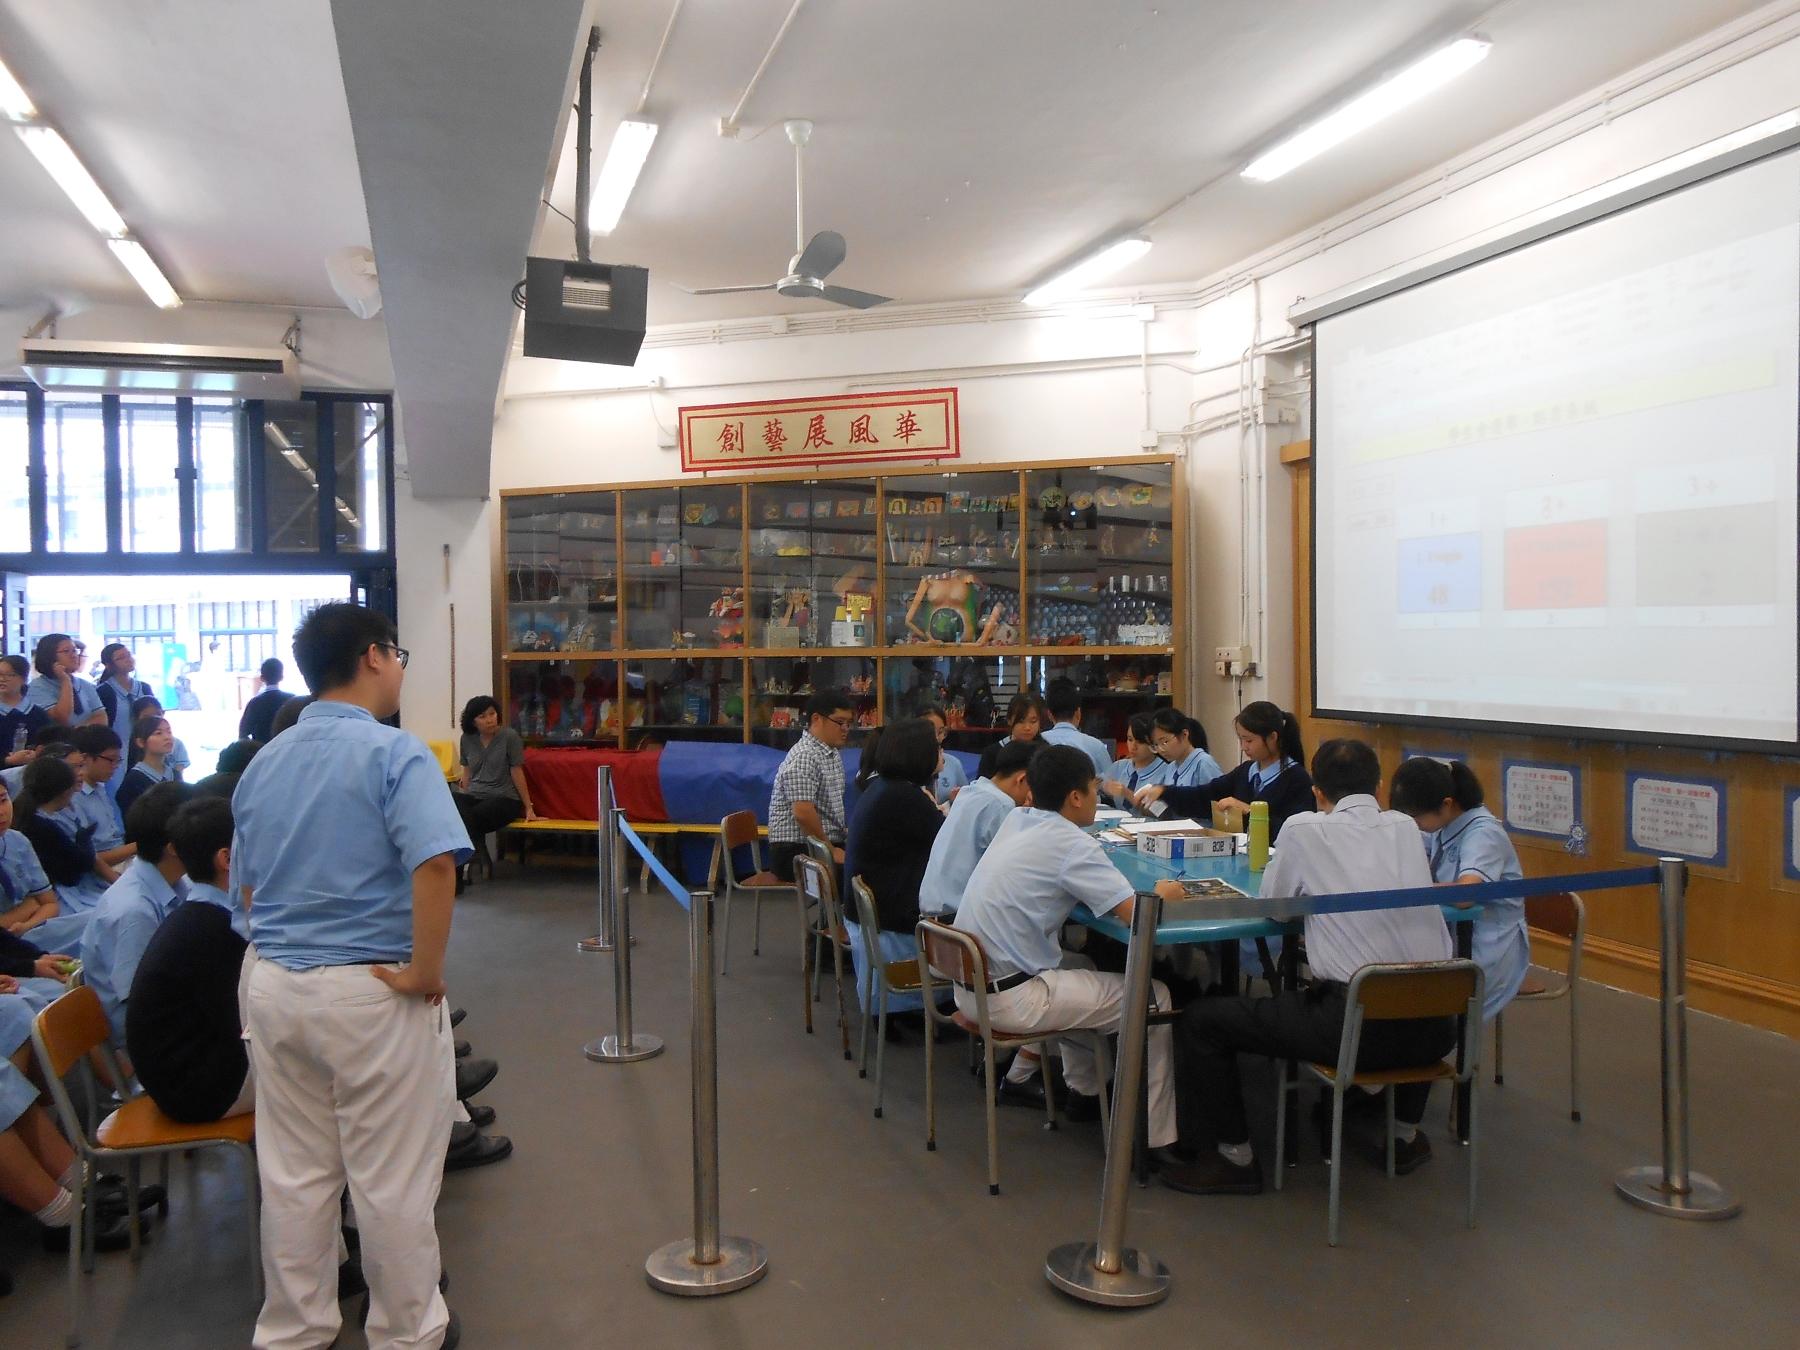 http://npc.edu.hk/sites/default/files/dscn2042.jpg